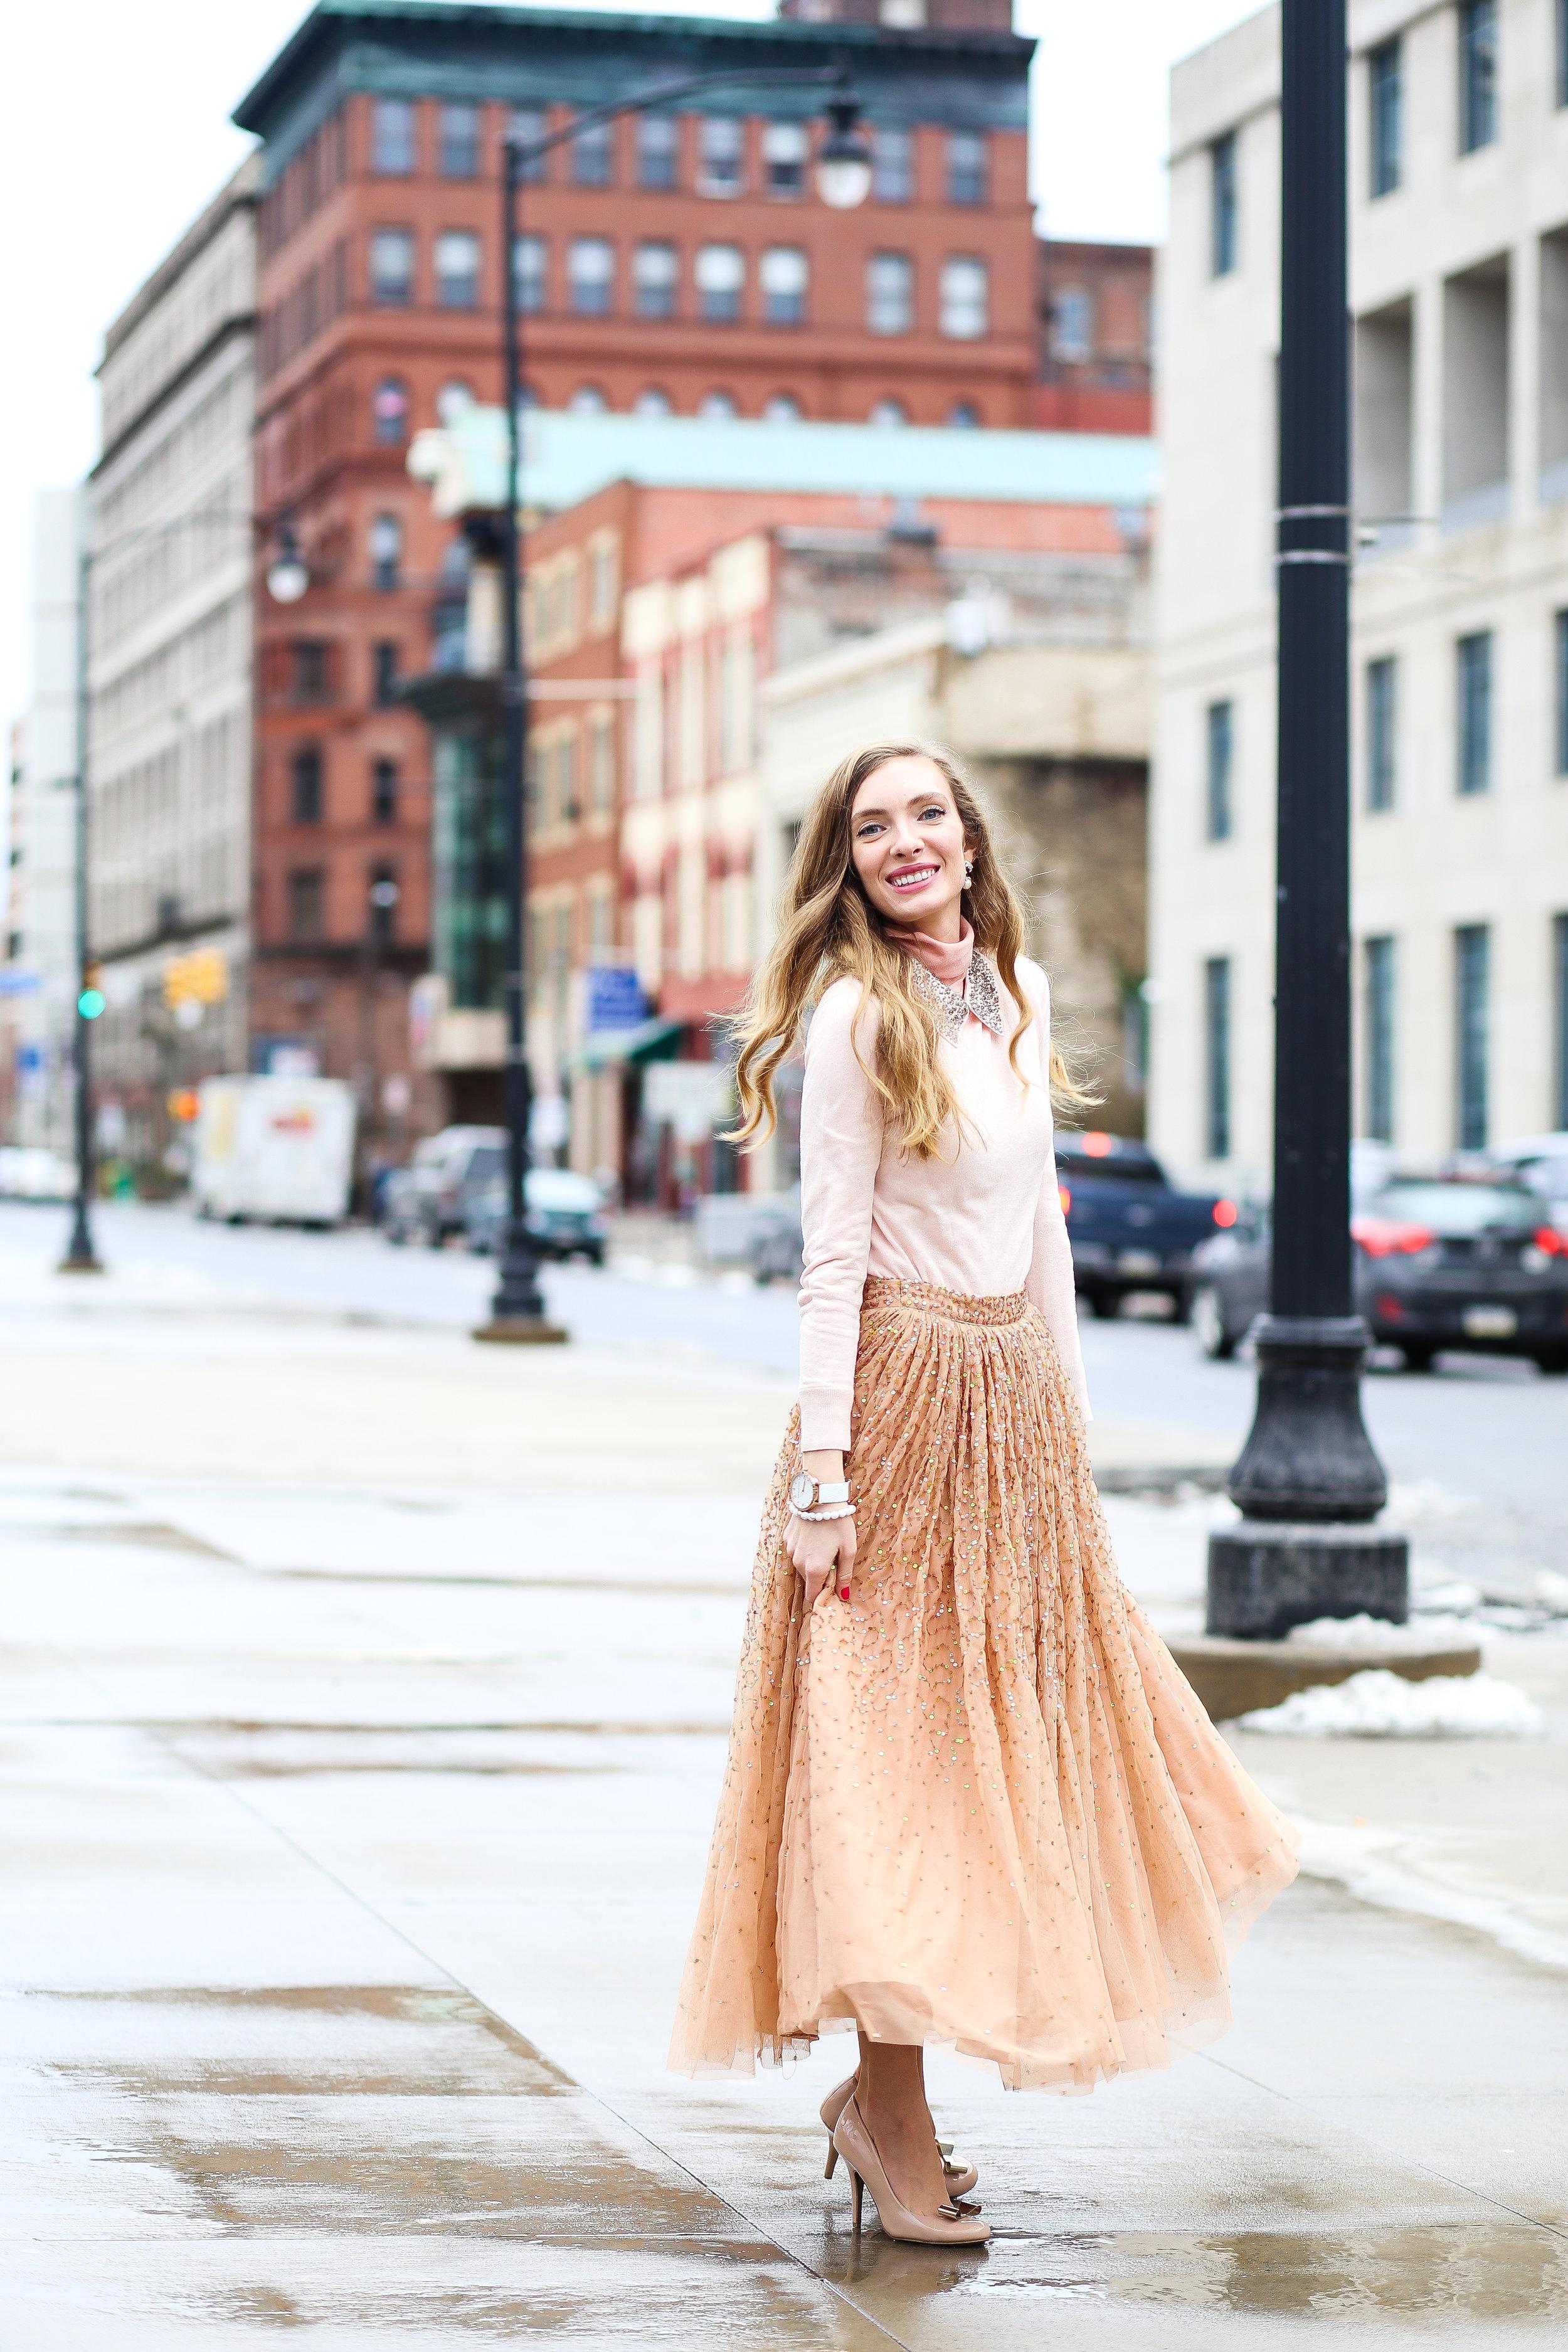 A Dash Of Sparkle- Enchanting Elegance